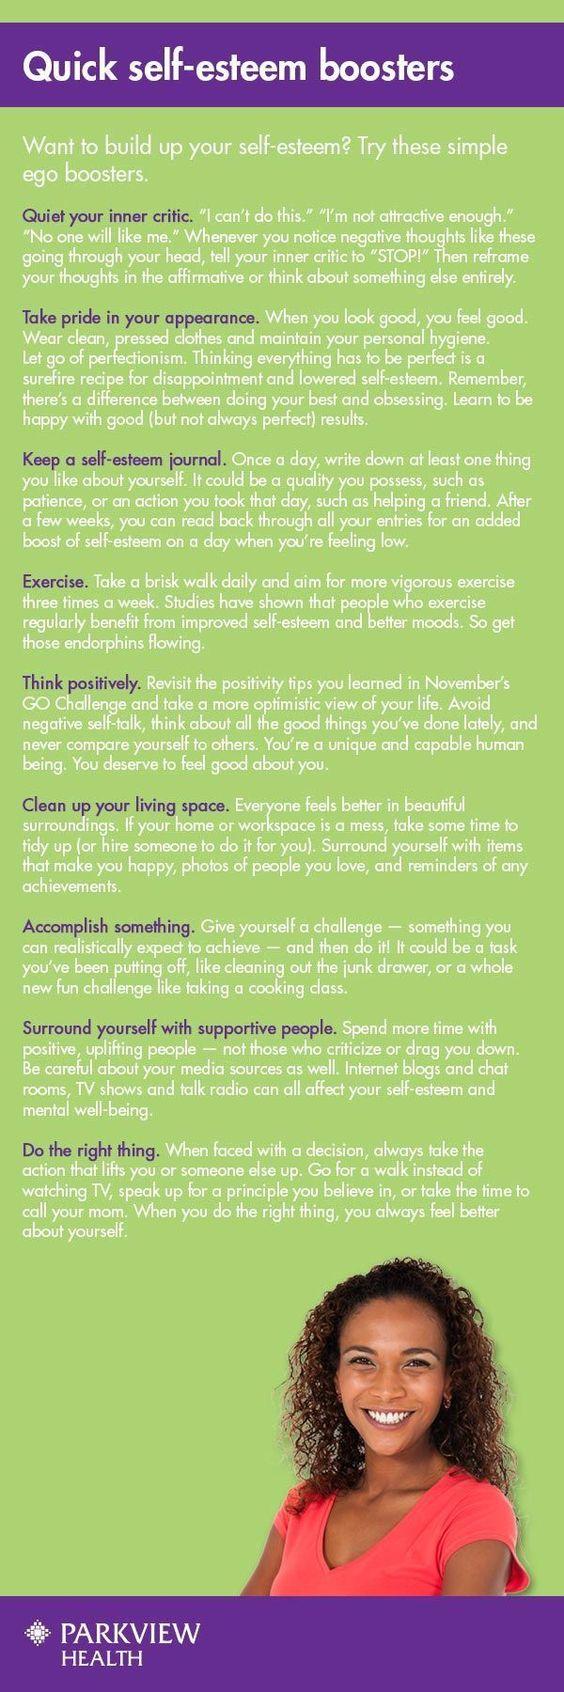 quick self esteem boosters